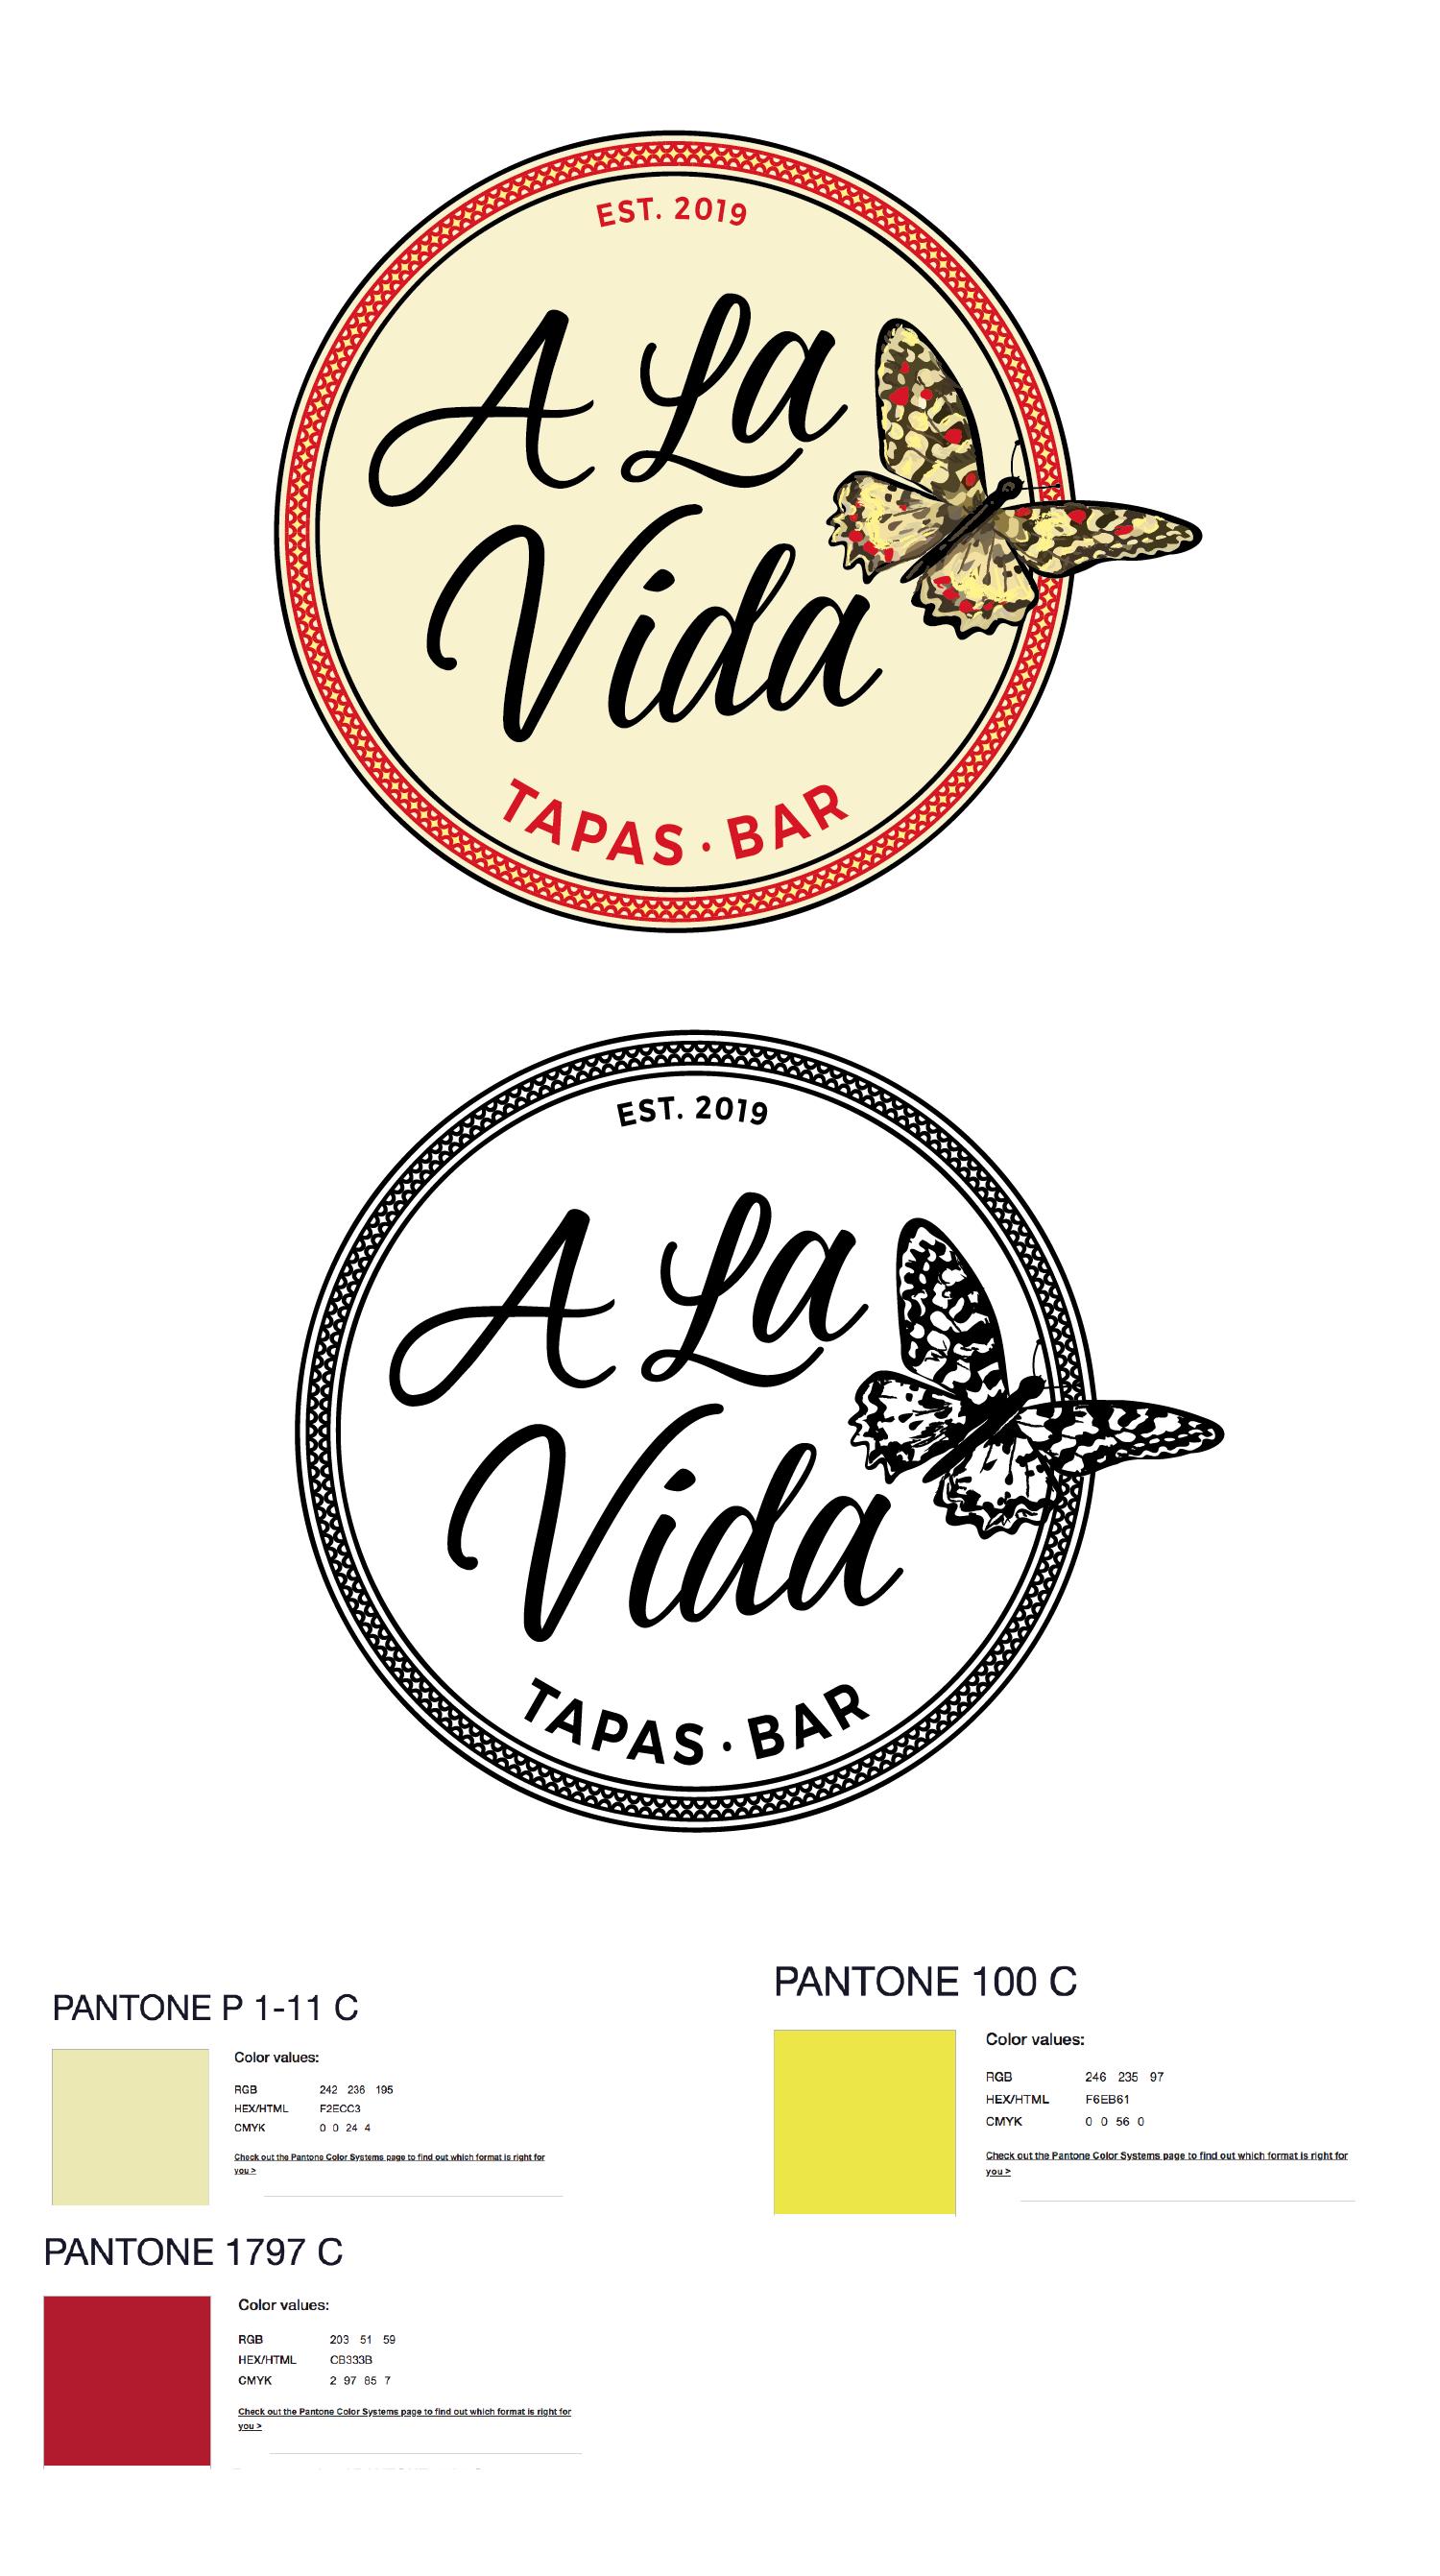 A La Vida   To the Life   Spanish Tapas in Seattle